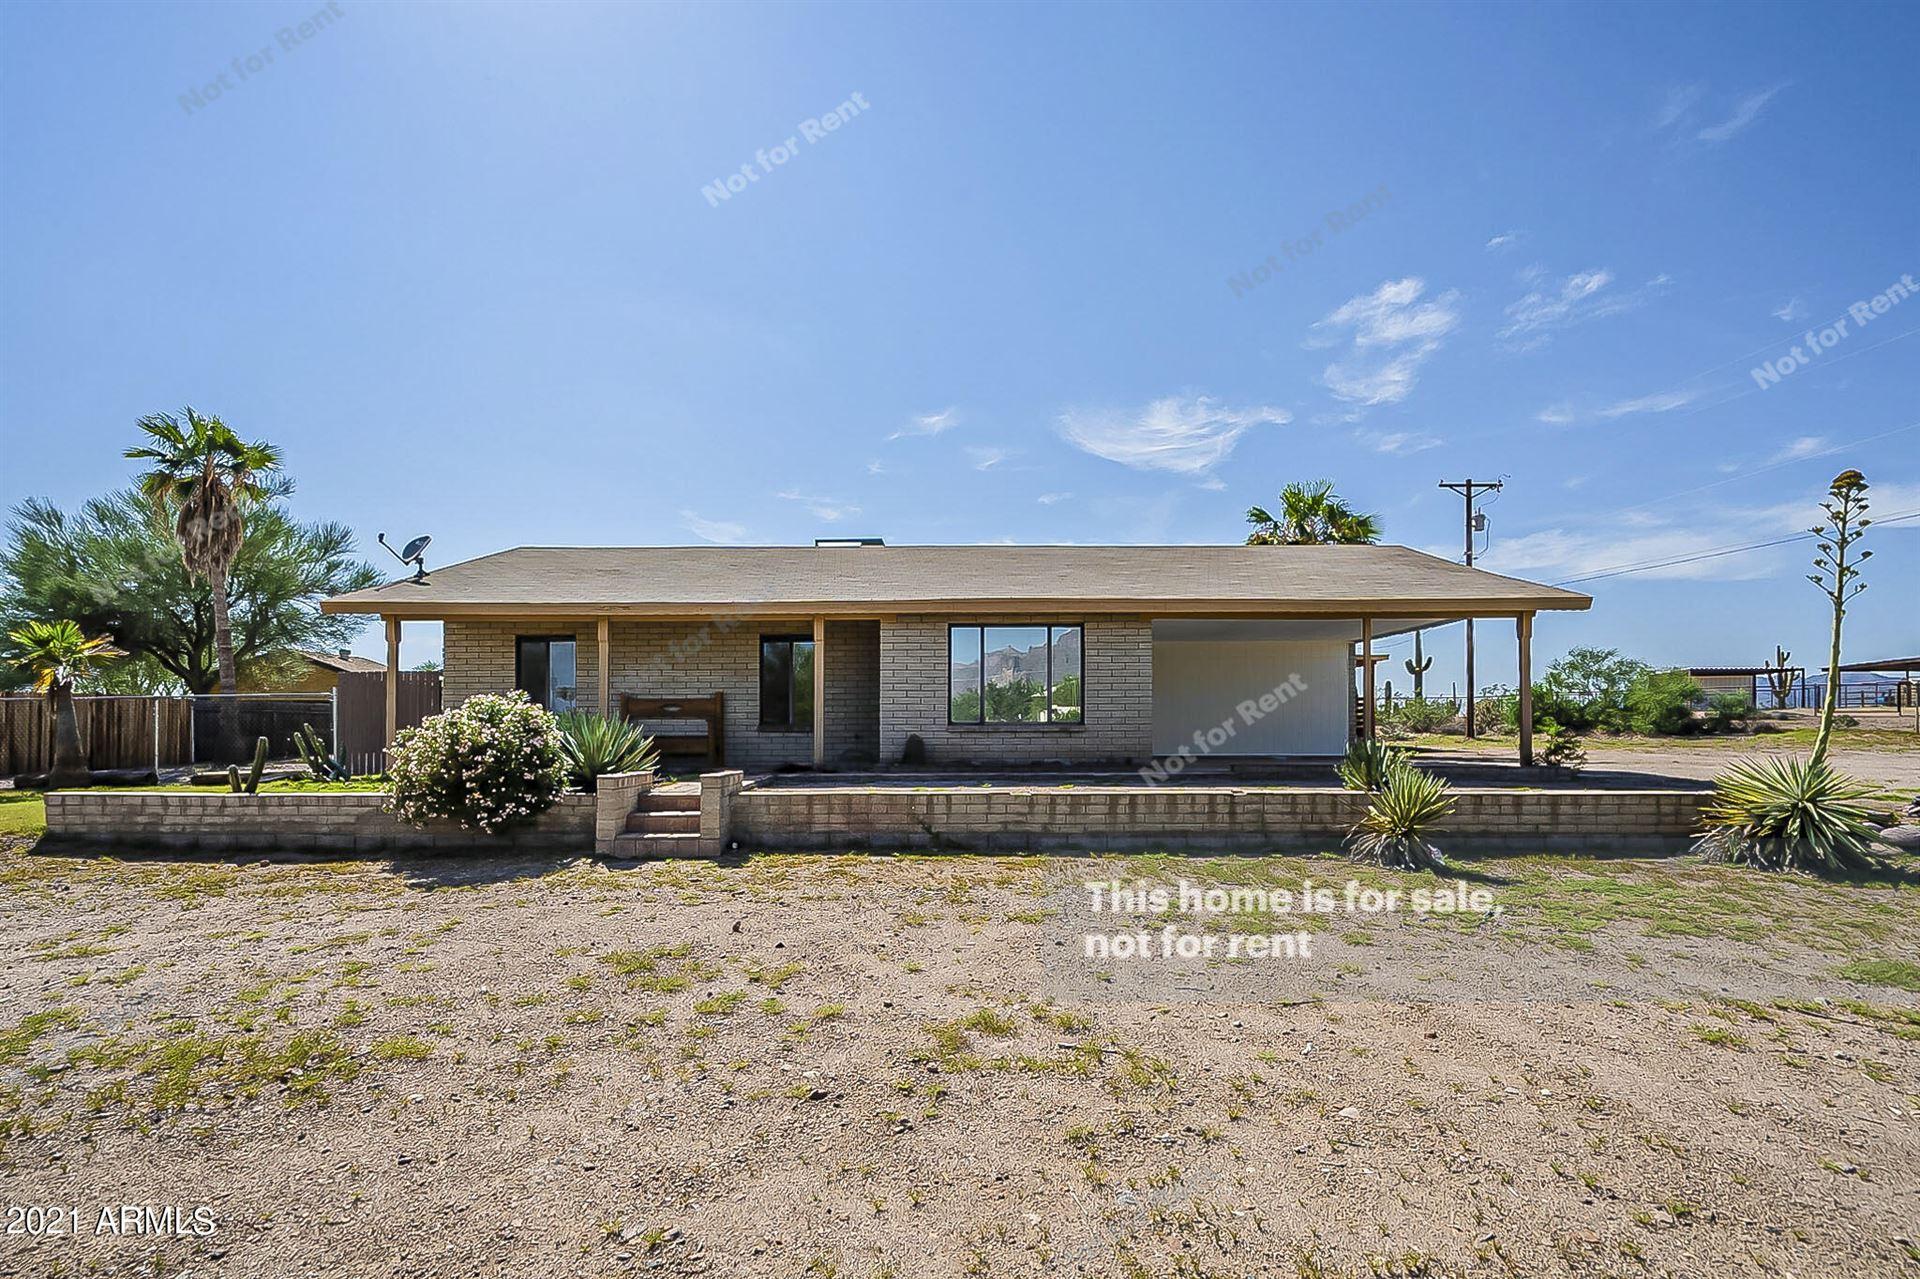 Photo of 1378 N WICKIUP Road, Apache Junction, AZ 85119 (MLS # 6289818)